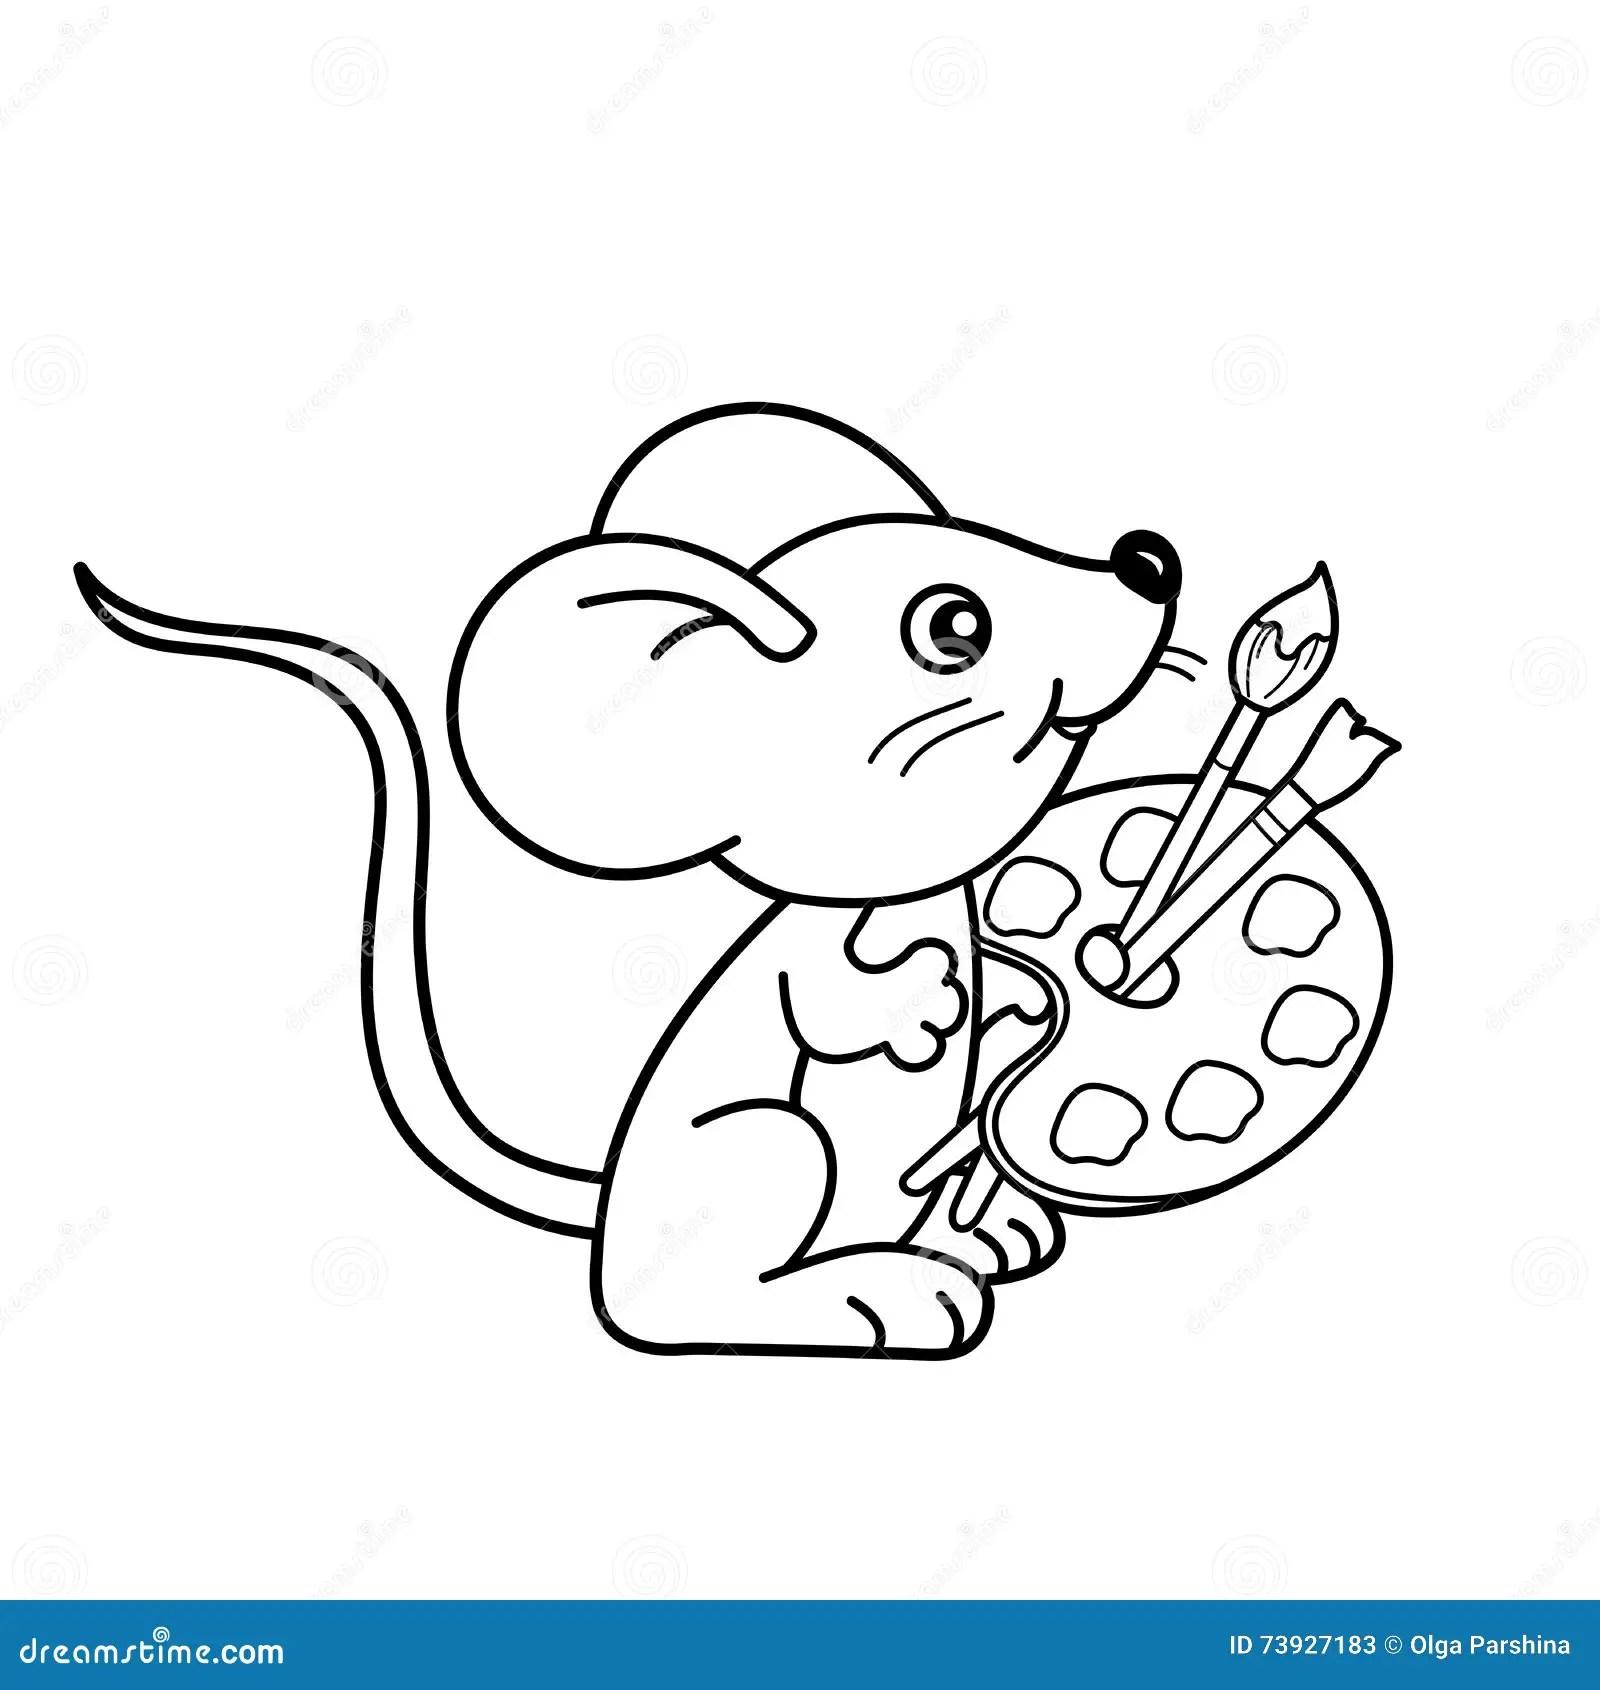 Mouse Paint Coloring Pages